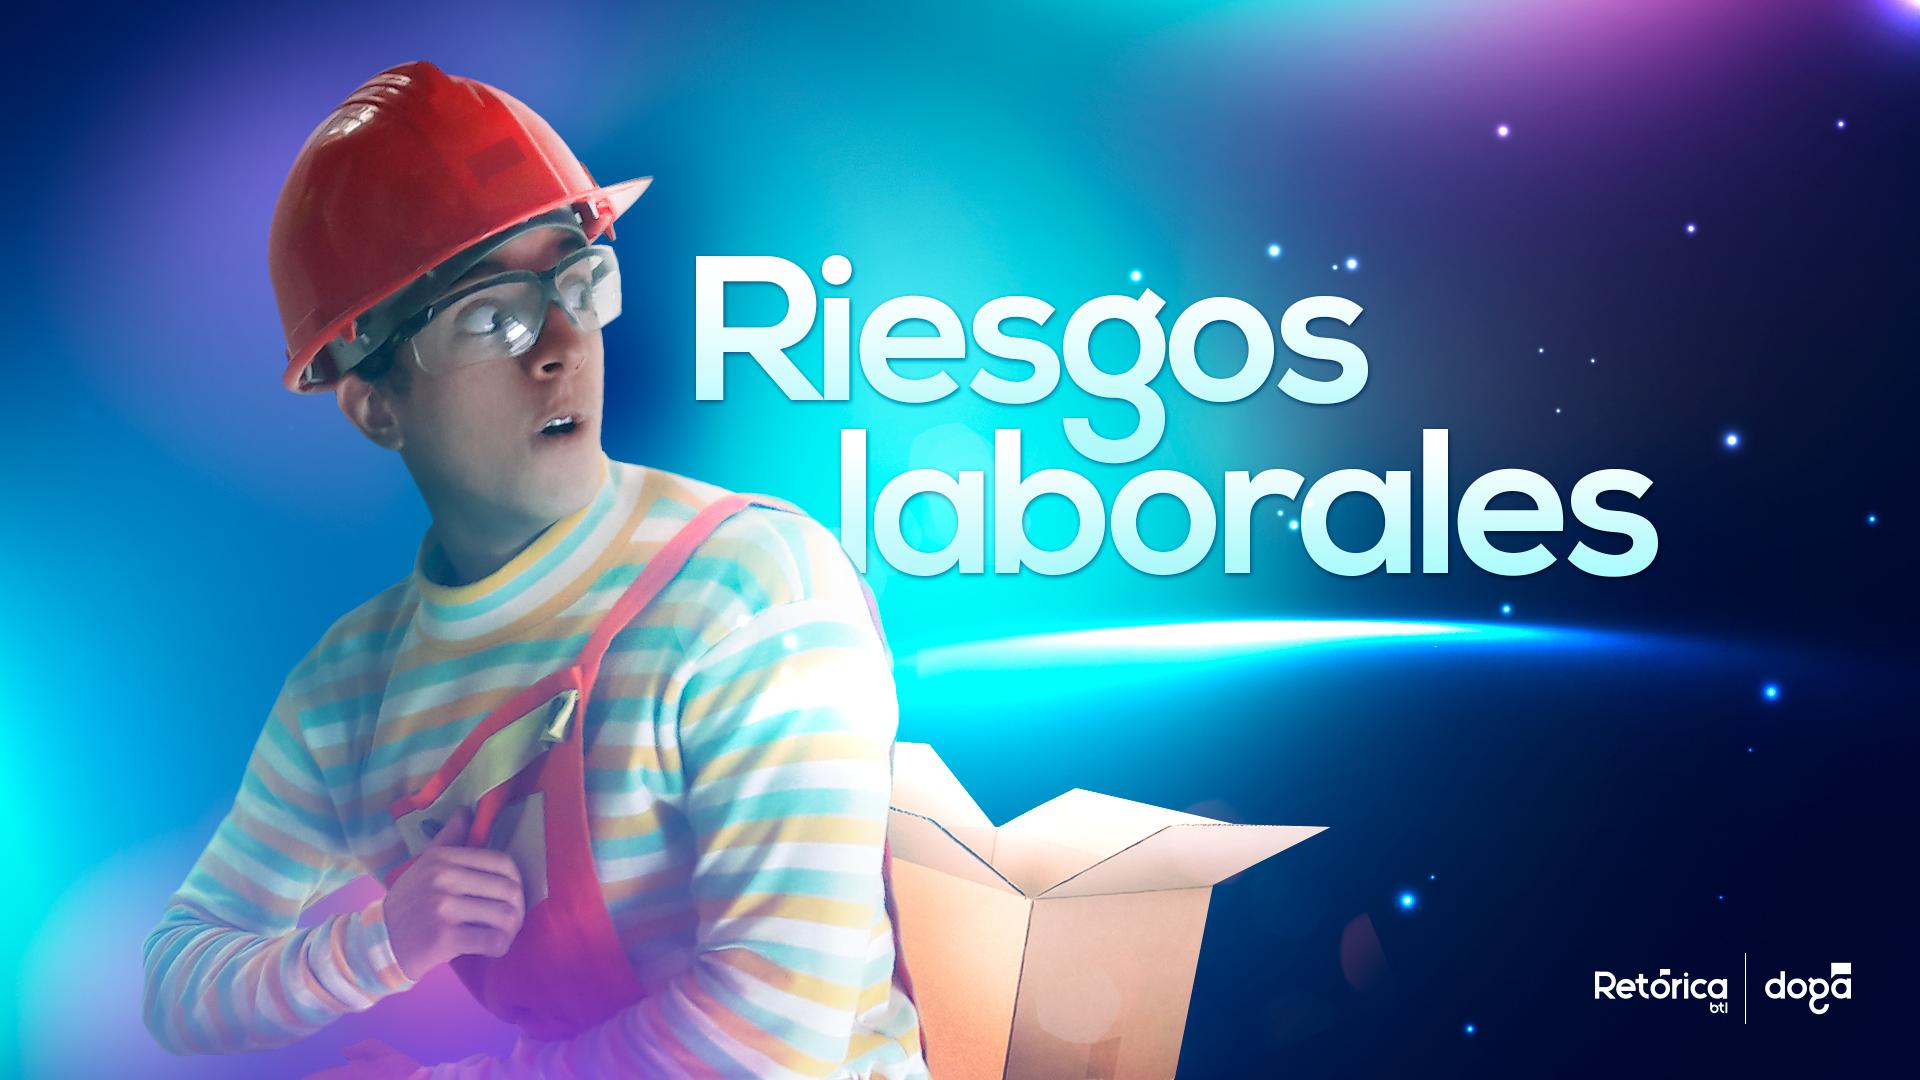 17_05_23_Riesgos_Laborales